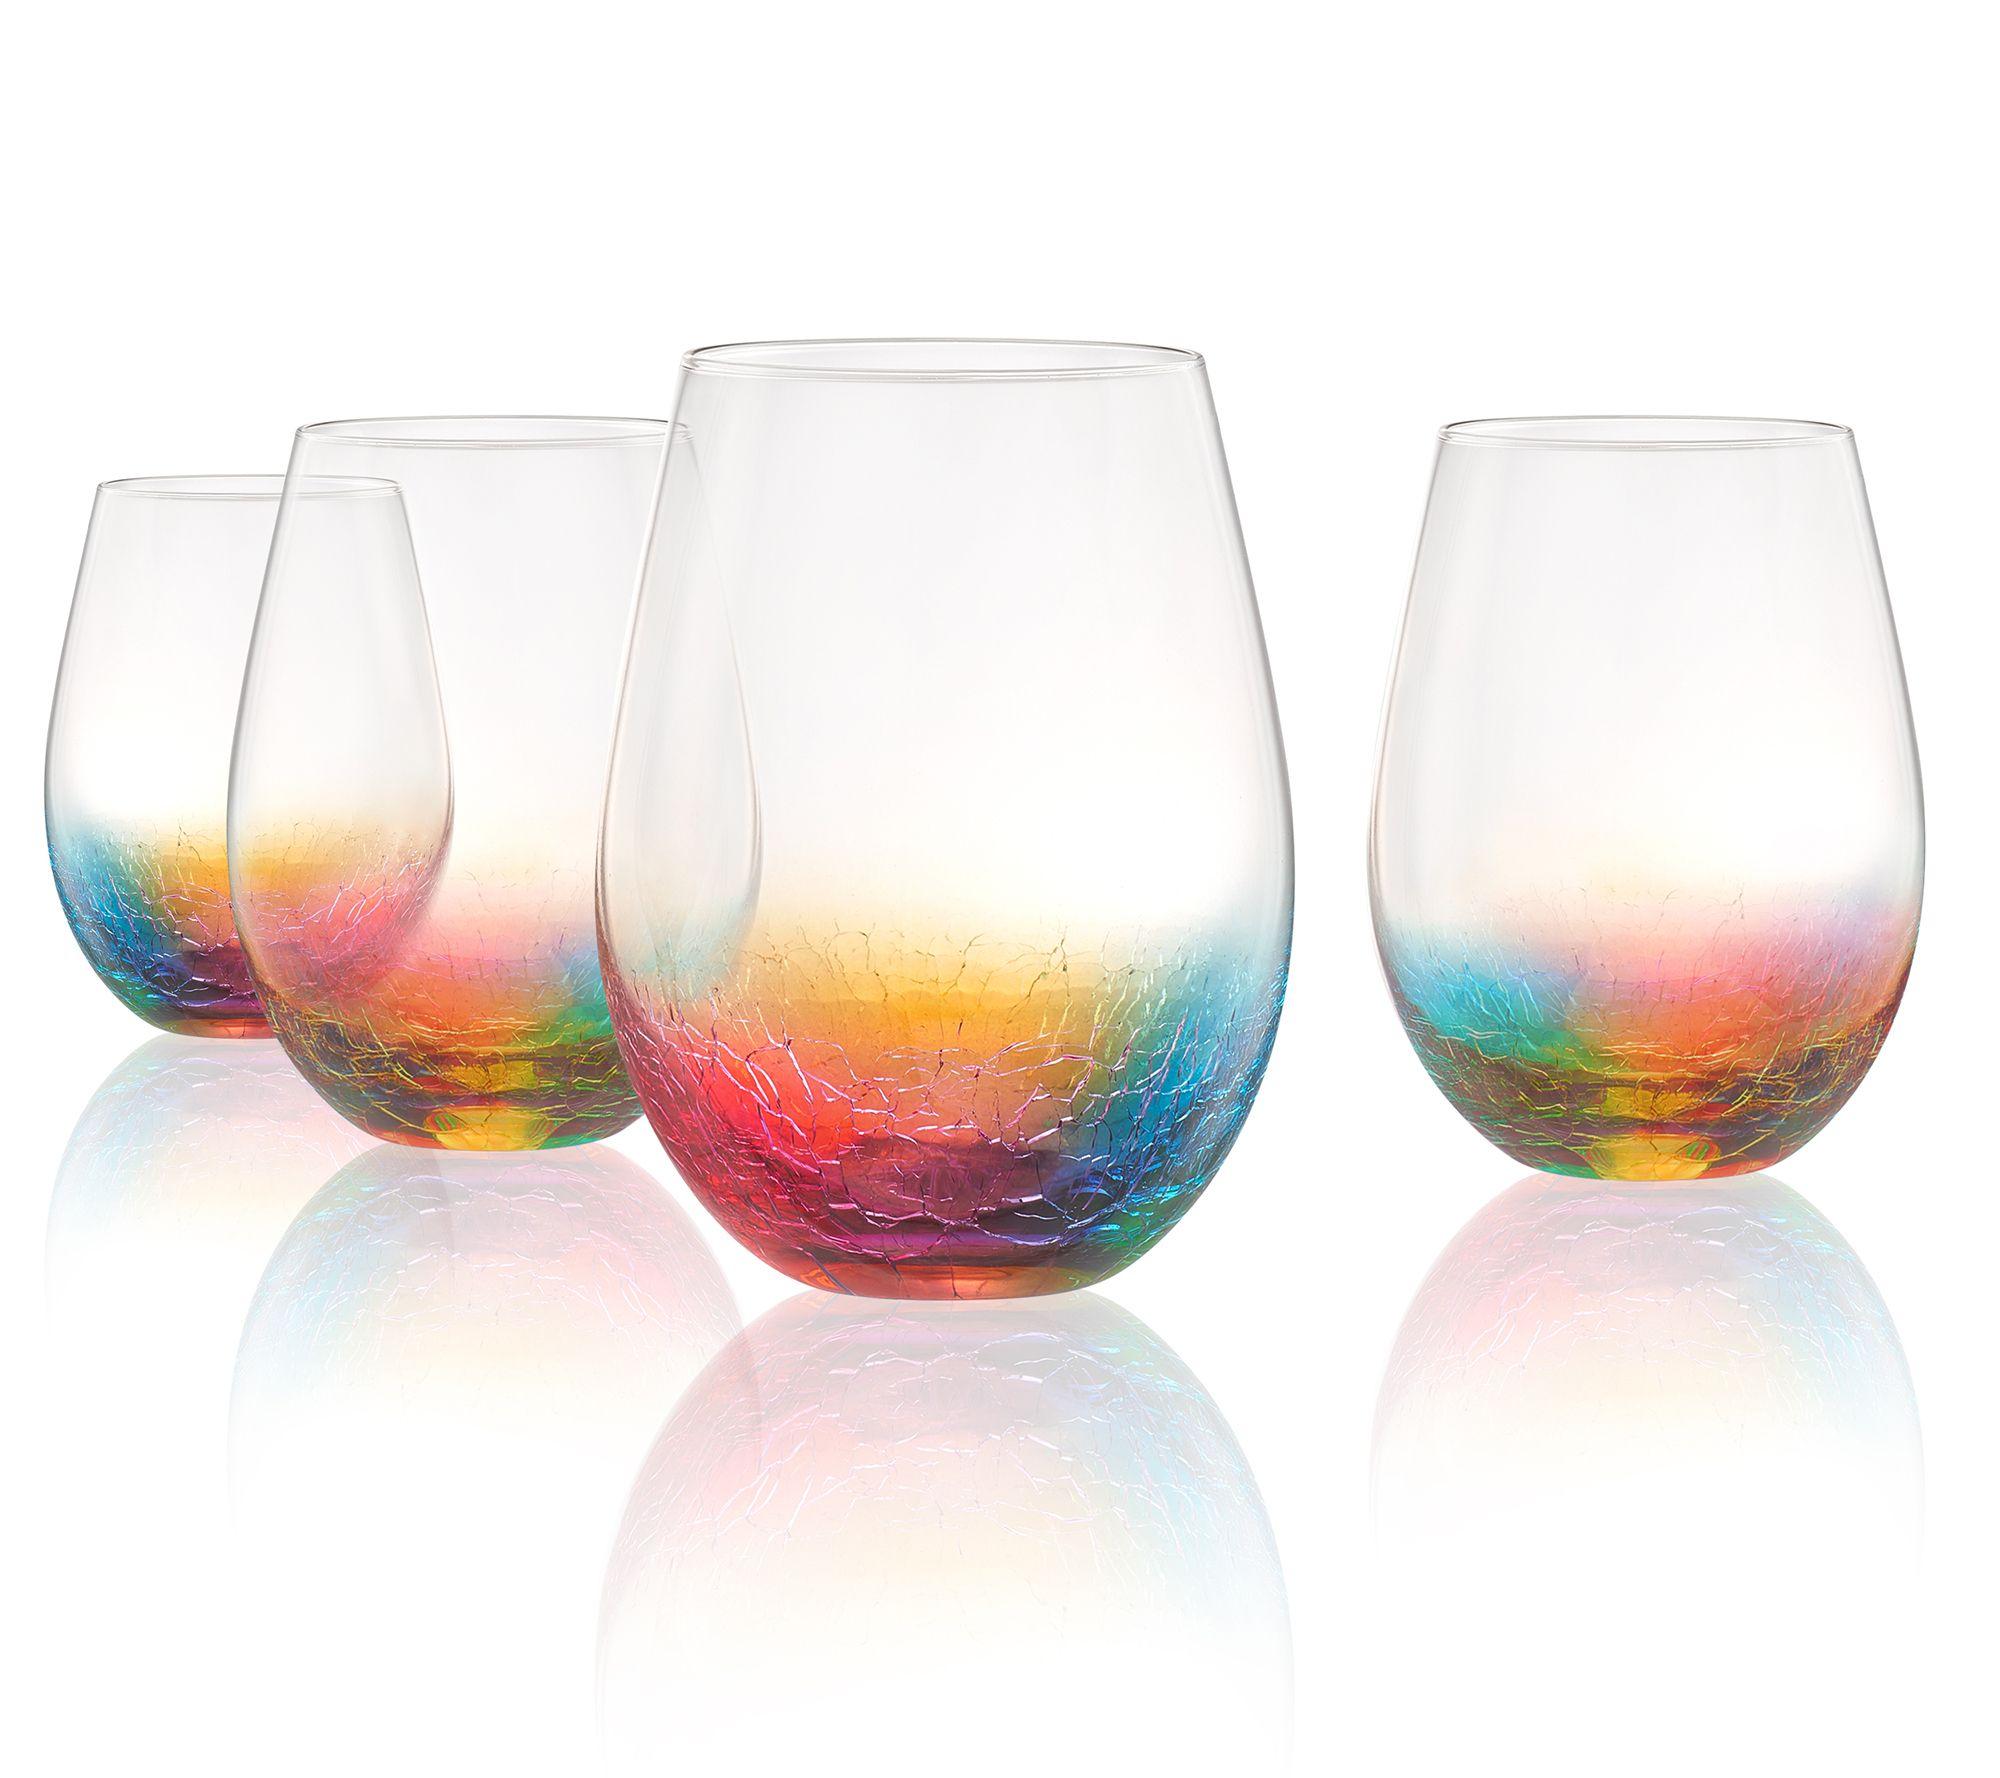 Artland Set Of 4 Neon Stemless Wine Glasses Qvc Com